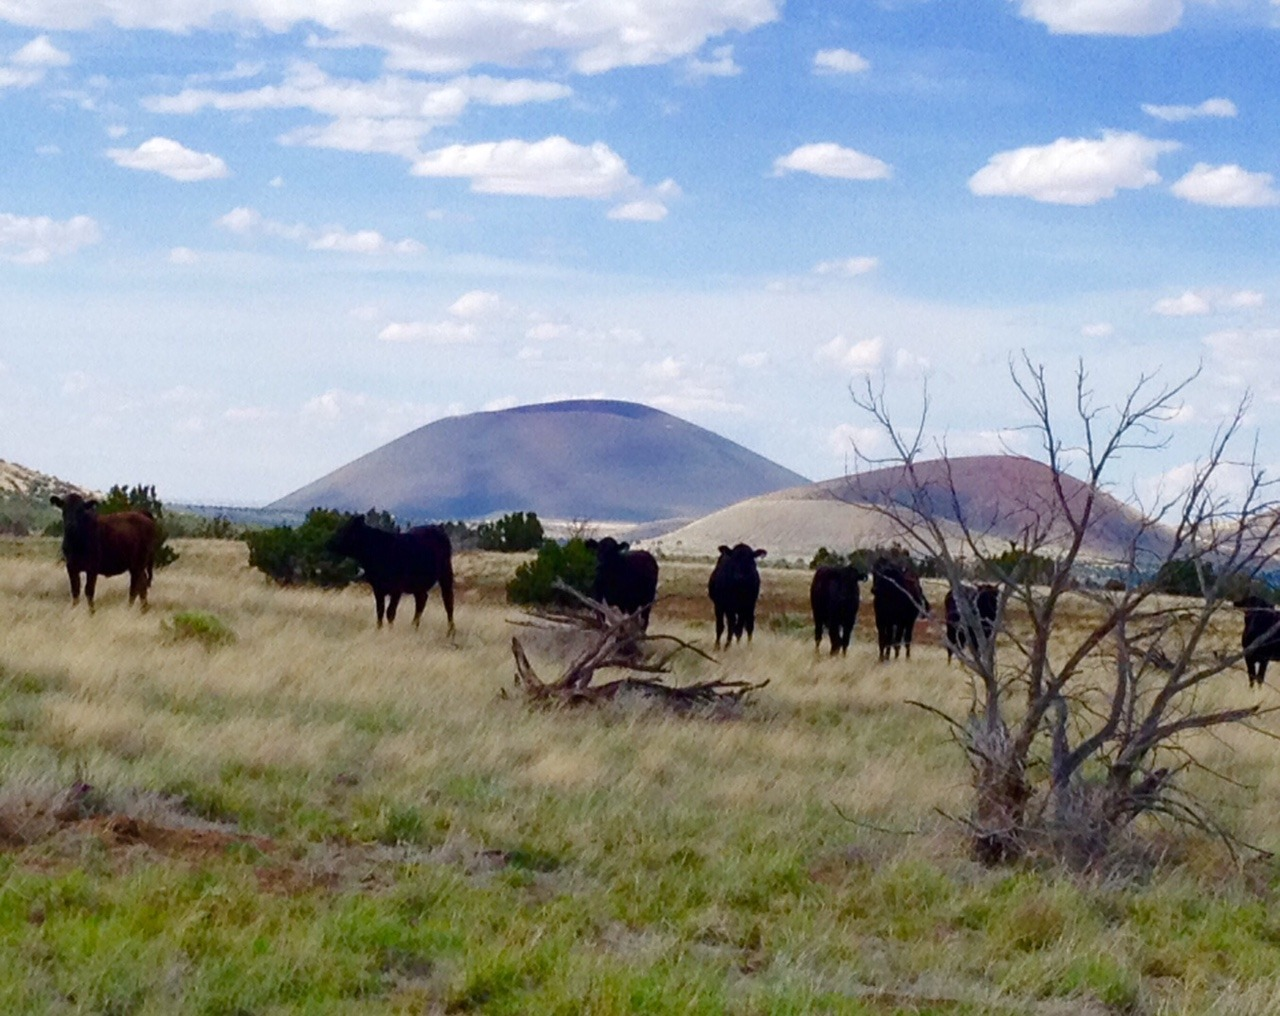 arizona black personals Cl arizona choose the site nearest you: flagstaff / sedona mohave county phoenix prescott.